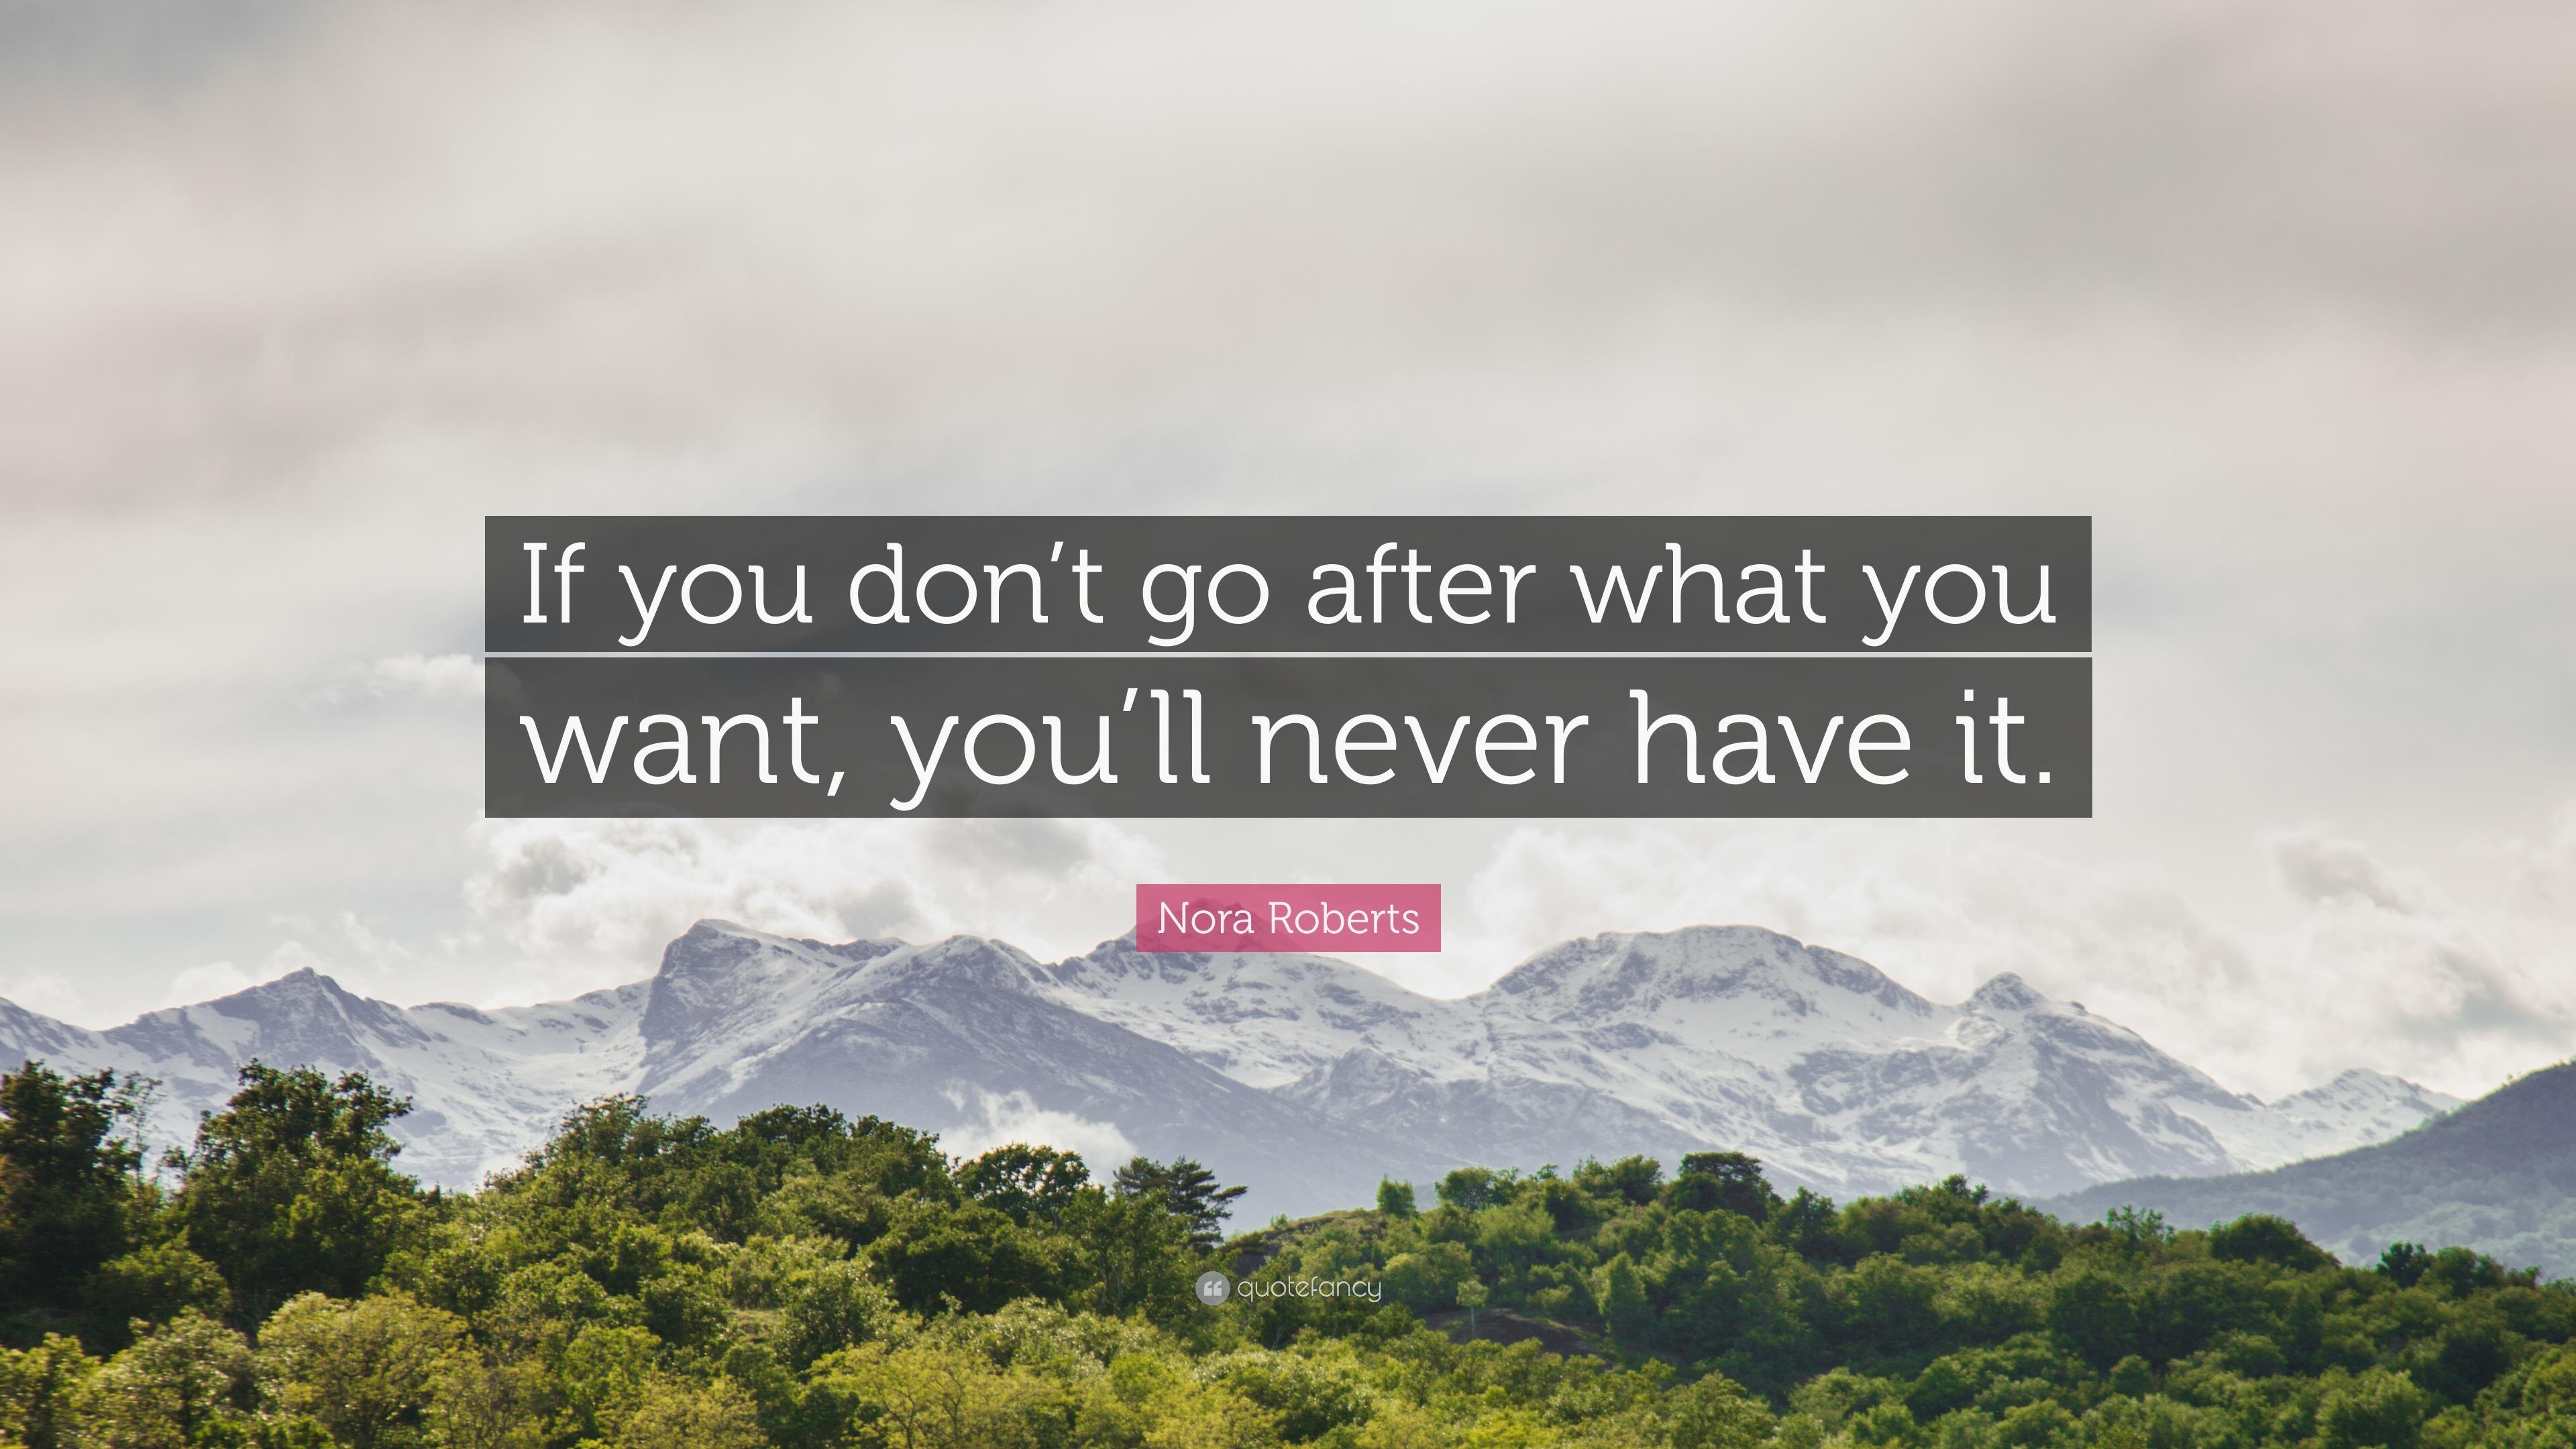 Nora Roberts Quotes (100 wallpapers) - Quotefancy